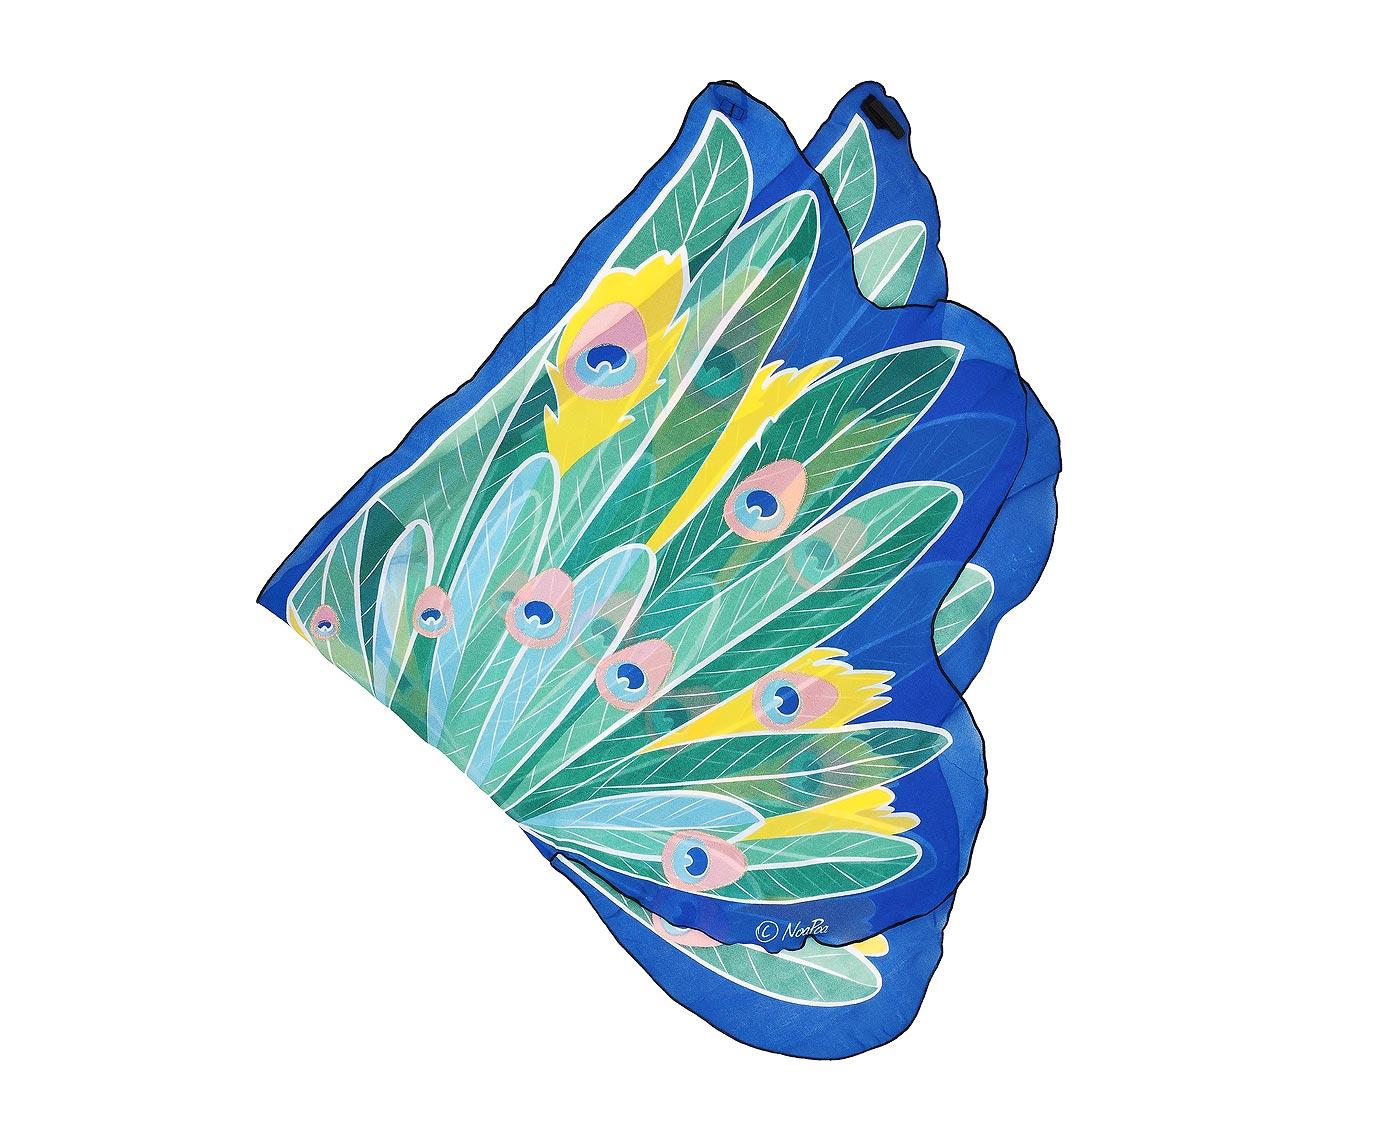 Vleugels 'Peacock' kleur